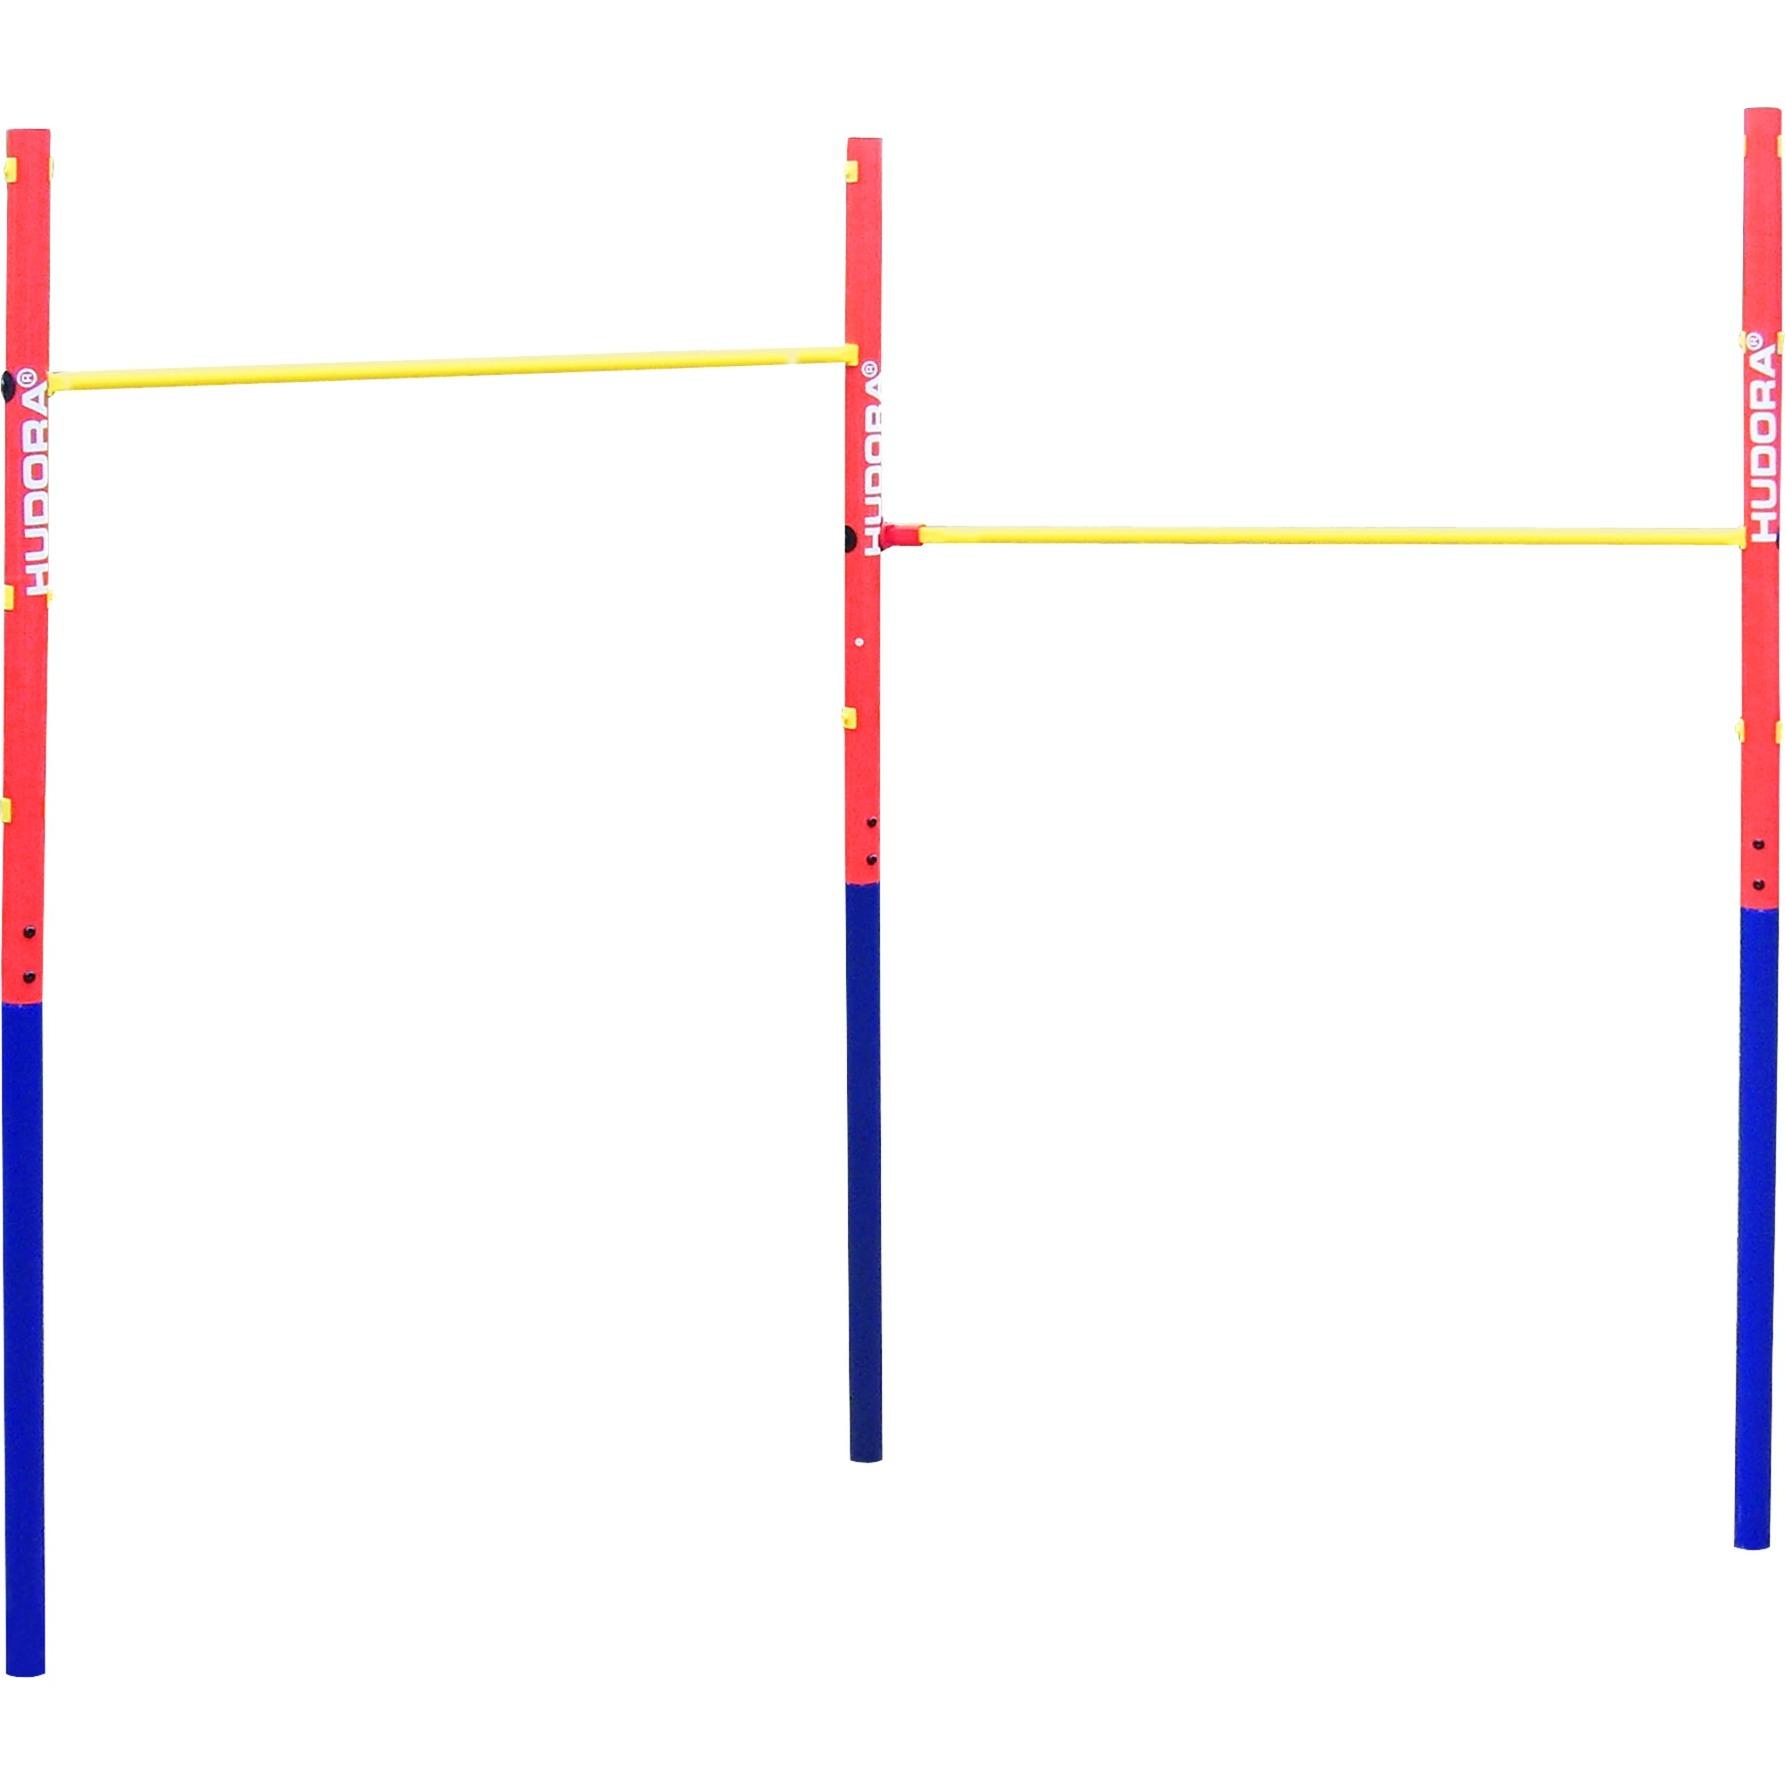 64002 100kg Azul, Rojo, Amarillo barra dominada, Aparato para fitness